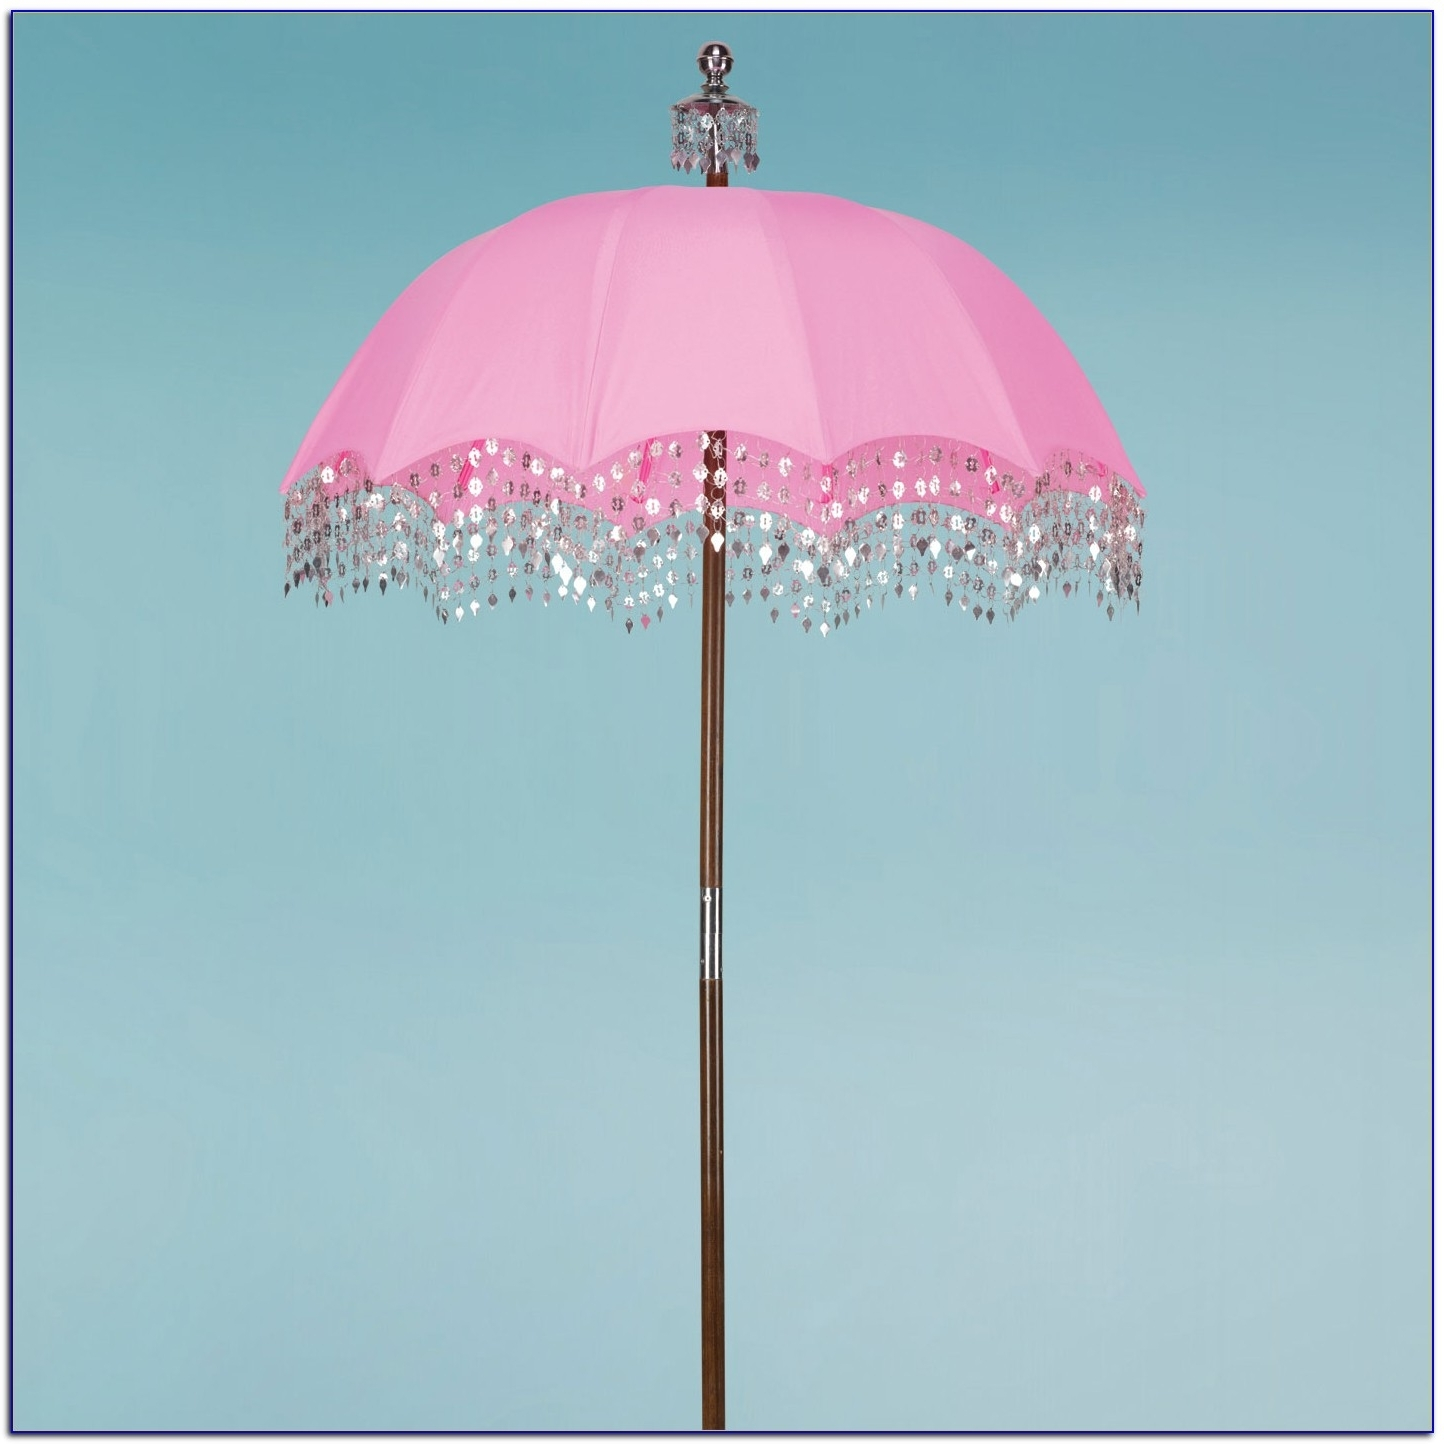 55 Pinks Patio, Pink Patio Umbrella Ebay; Ebay Patio Table Umbrella Pertaining To Most Up To Date Pink Patio Umbrellas (Gallery 12 of 20)